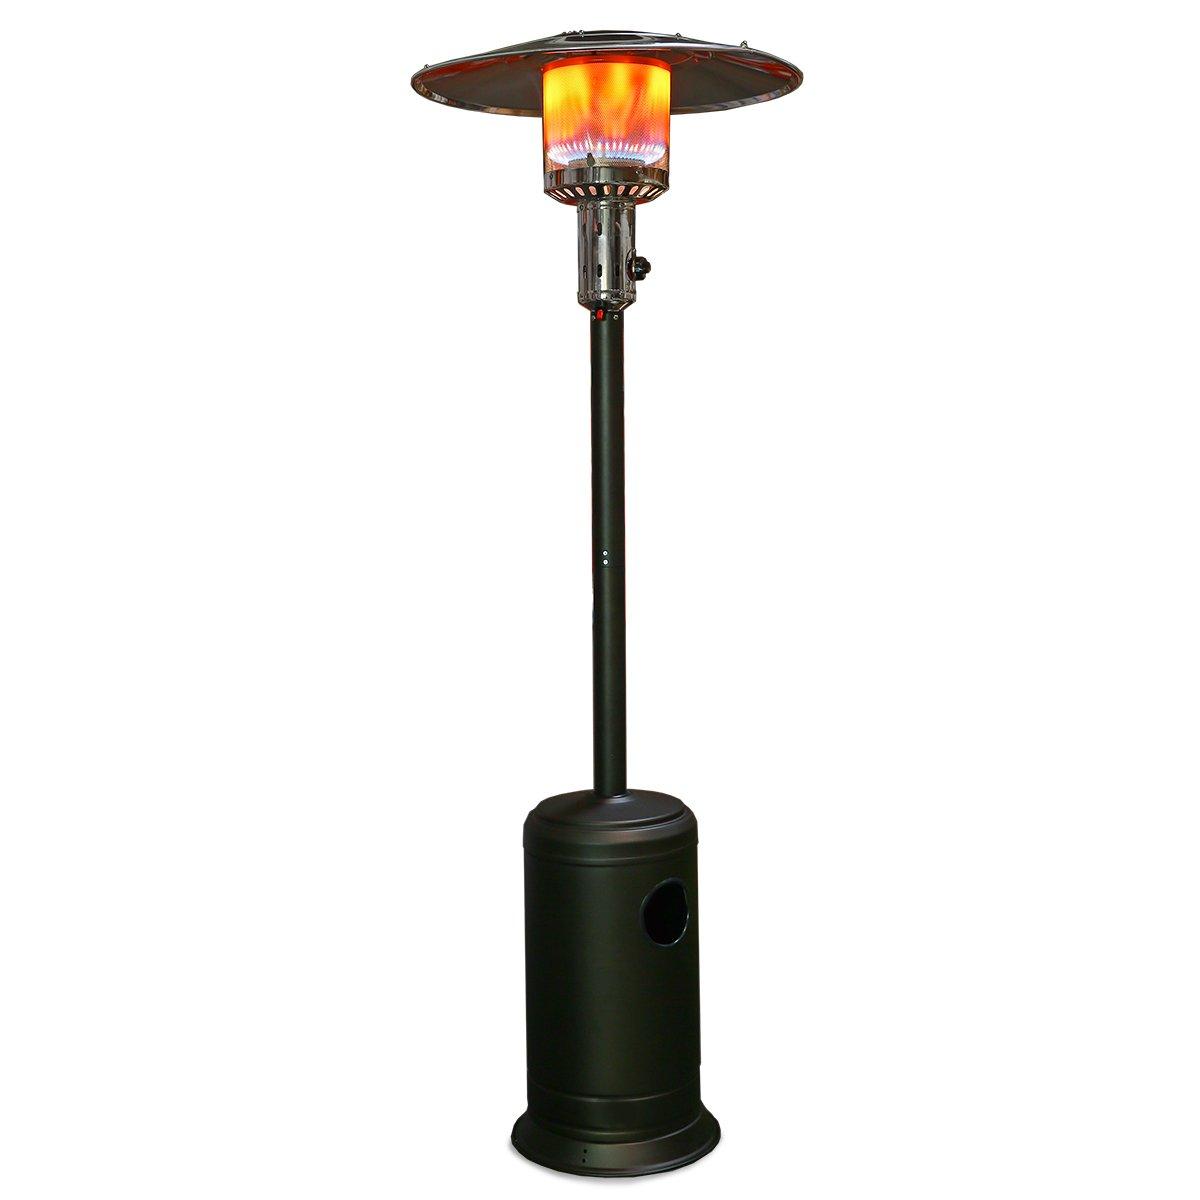 XtremepowerUS 48,000 BTU Premium Floor Standing Propane Outdoor Patio Heater    Mocha: Amazon.ca: Patio, Lawn U0026 Garden